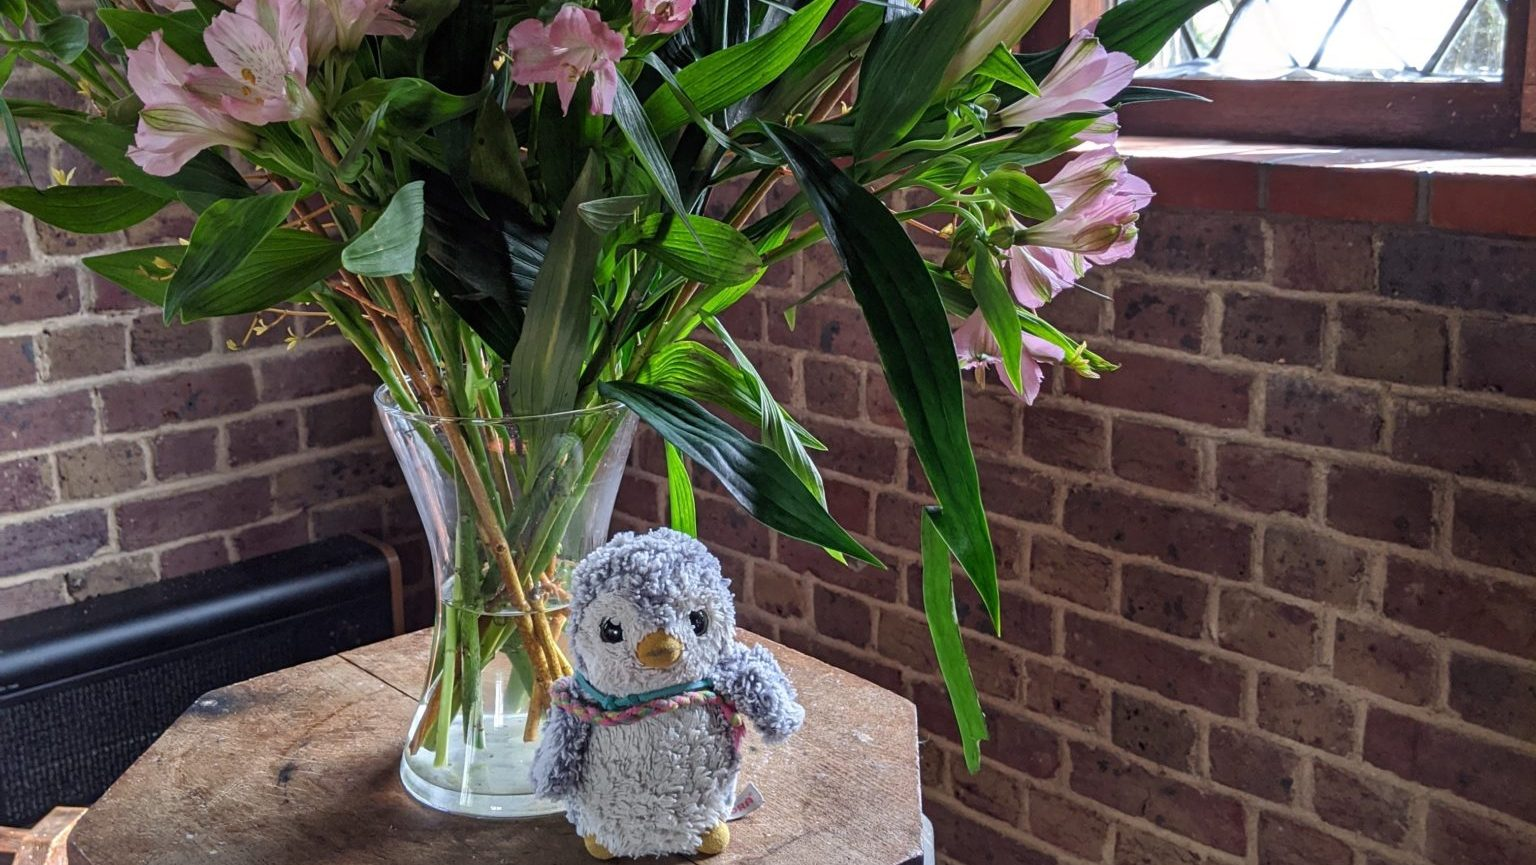 Arnold & flowers